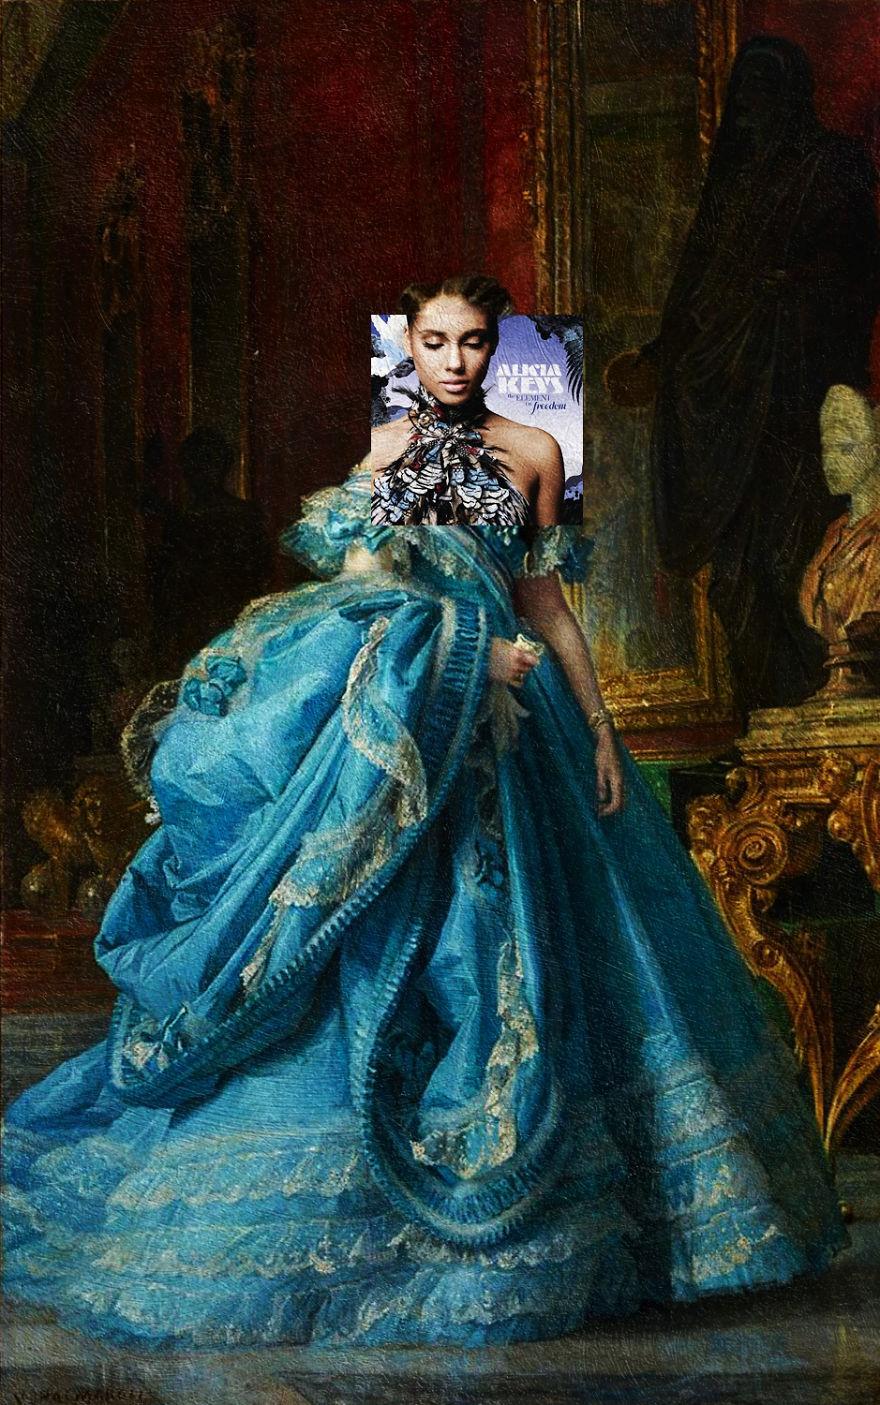 The Element Of Freedom By Alicia Keys + La Infanta Isabel De Bourbon E Bourbon By Vicente Palmaroli